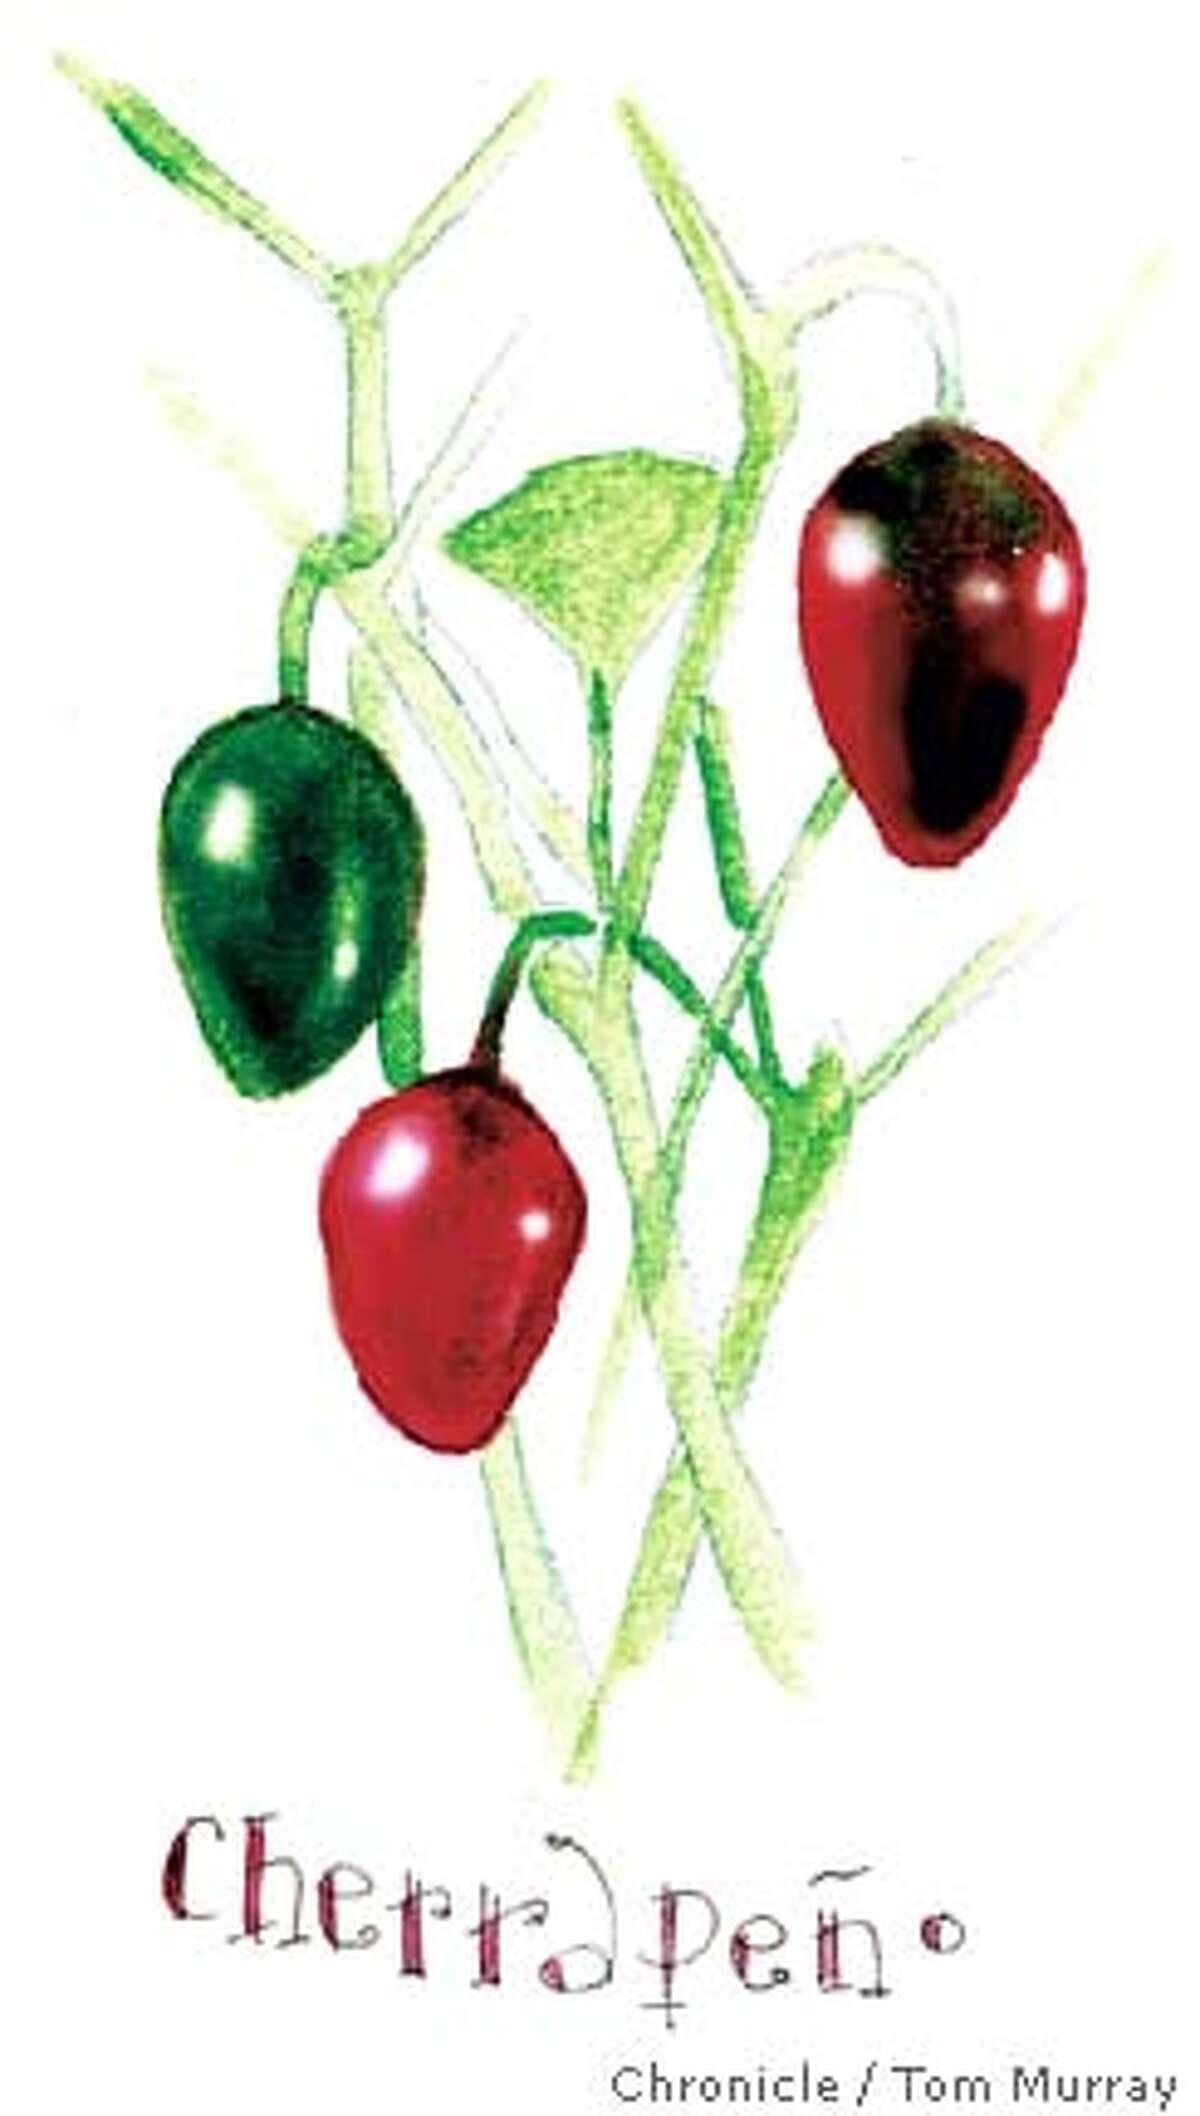 cherrapeno peppers